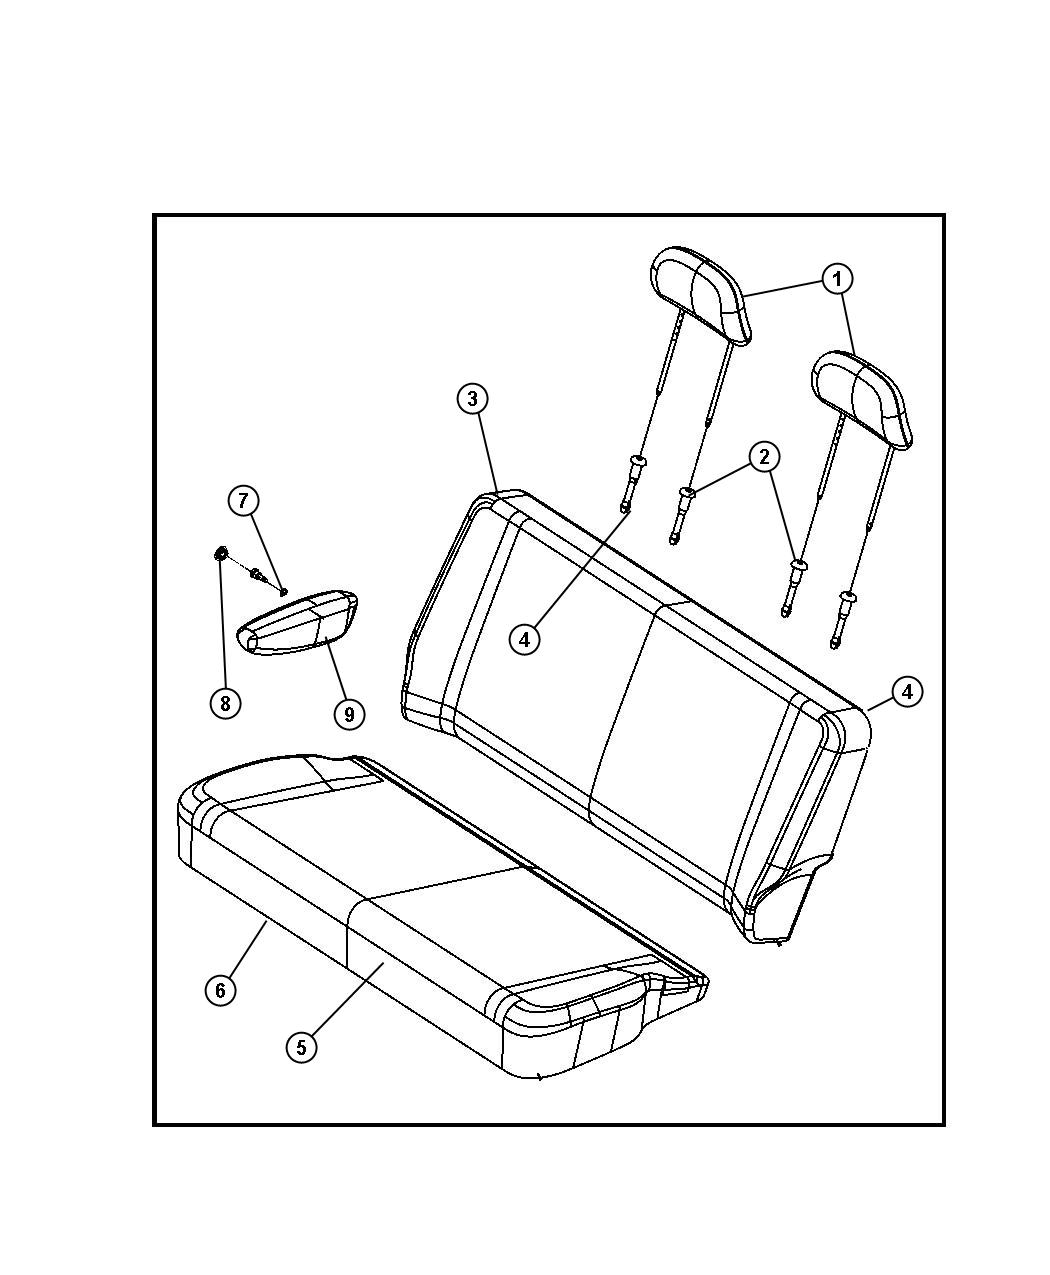 Chrysler Town & Country Sleeve. Headrest. Locking. [ll